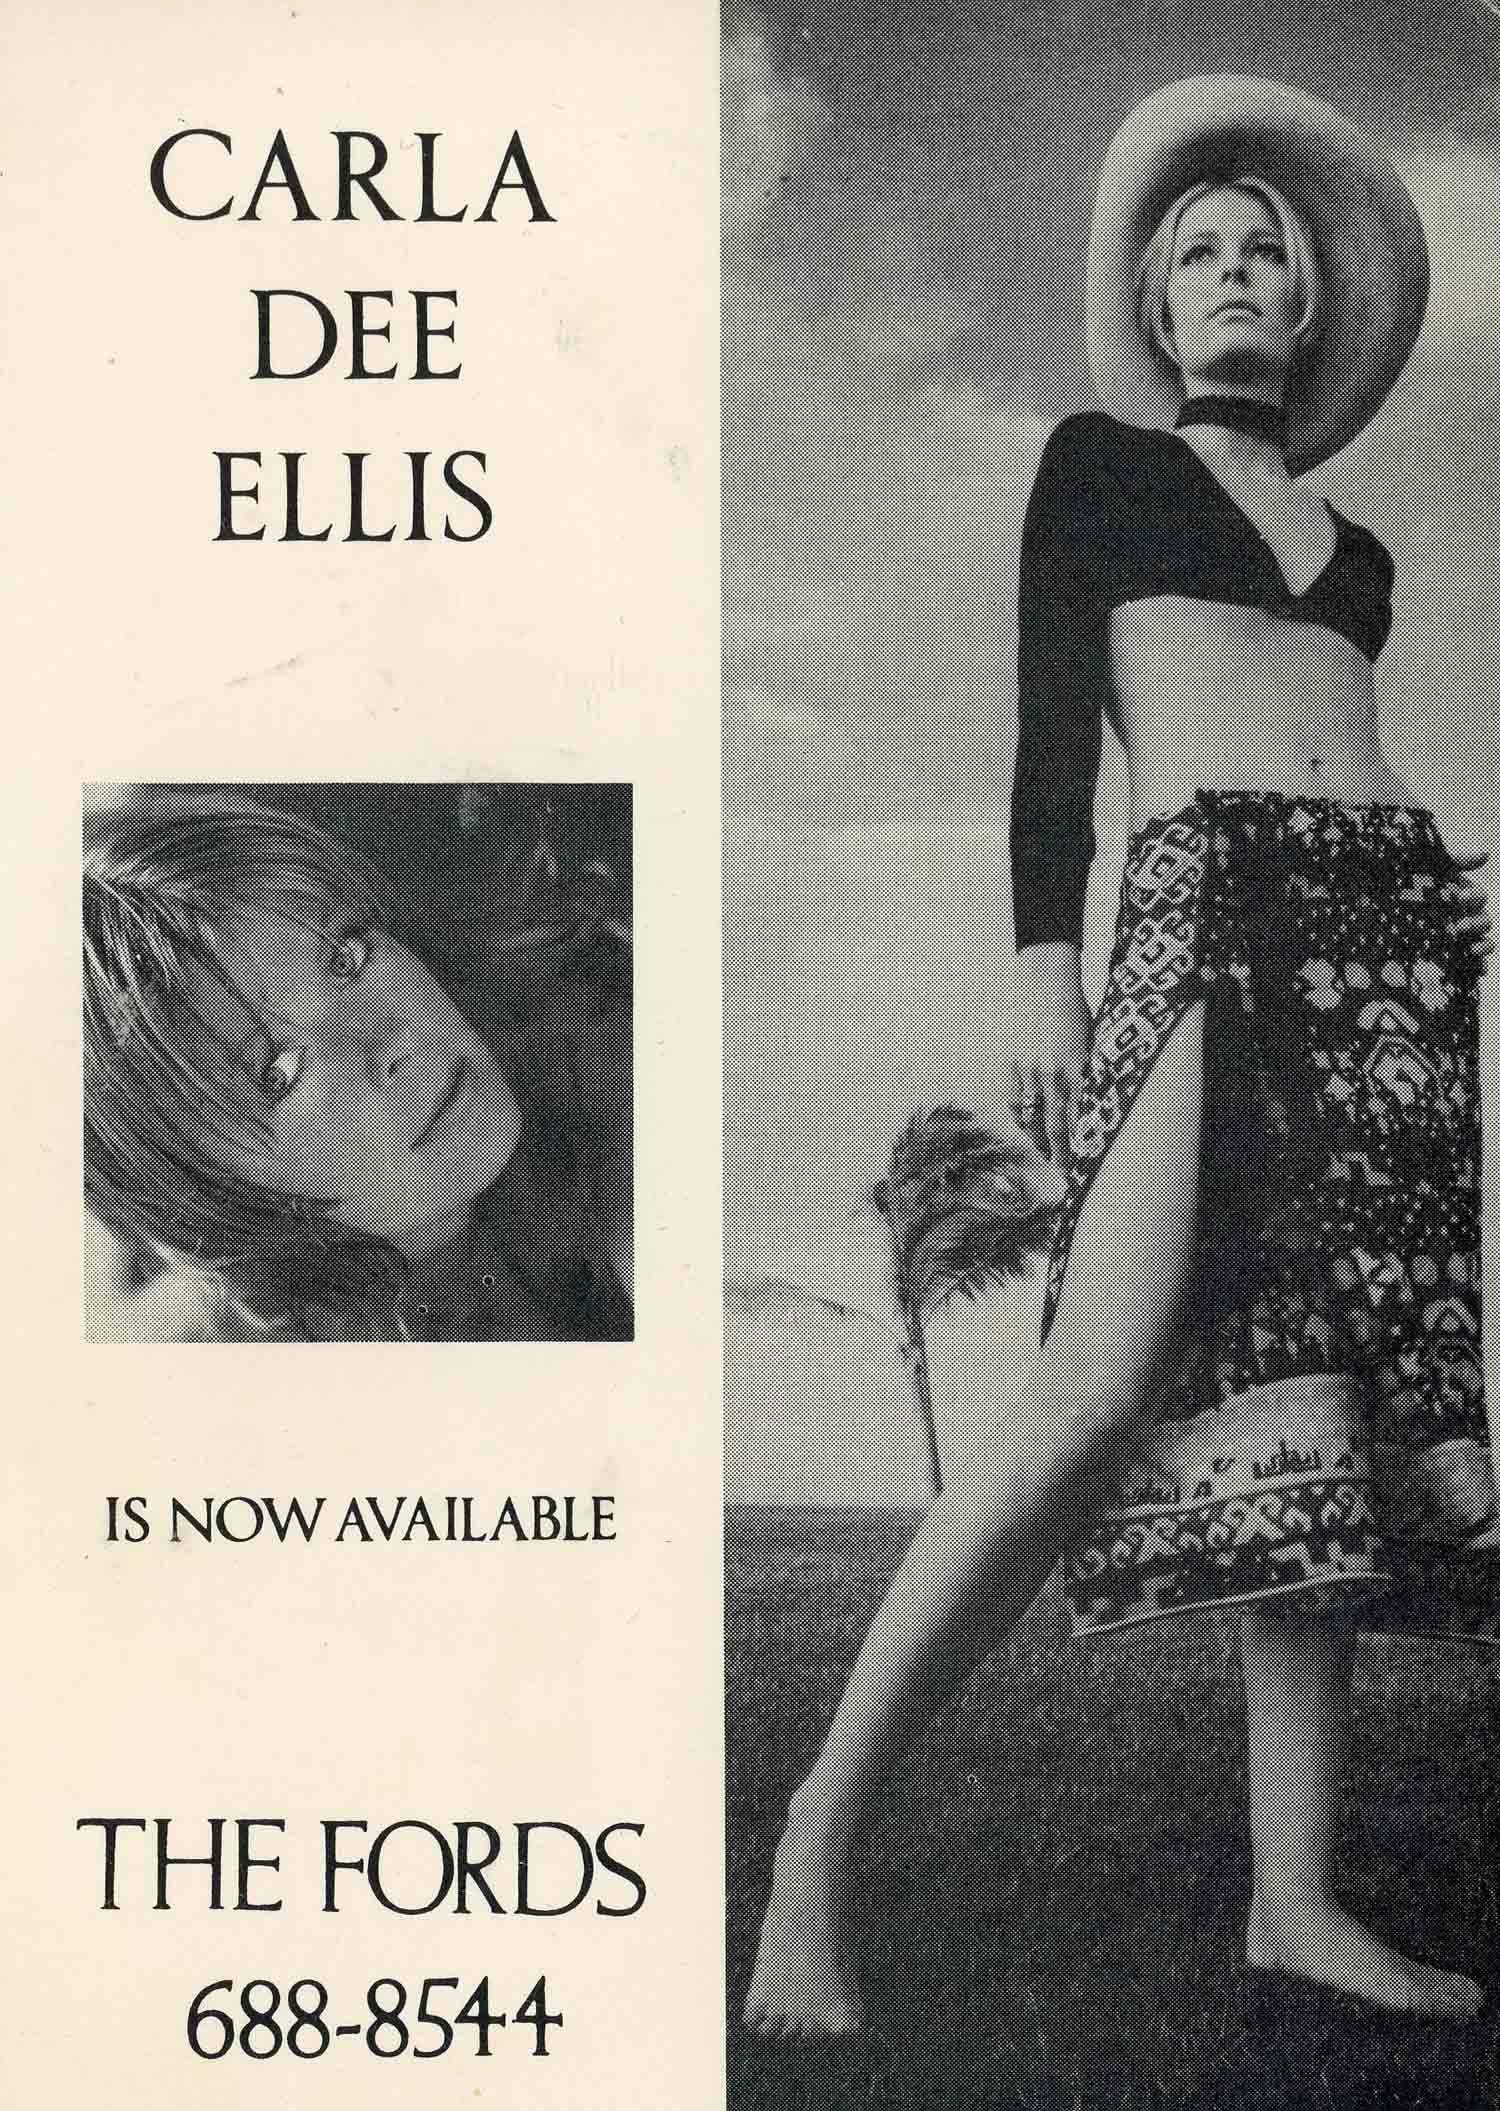 Ford Modeling Agency postcard for Carla, c. 1971.